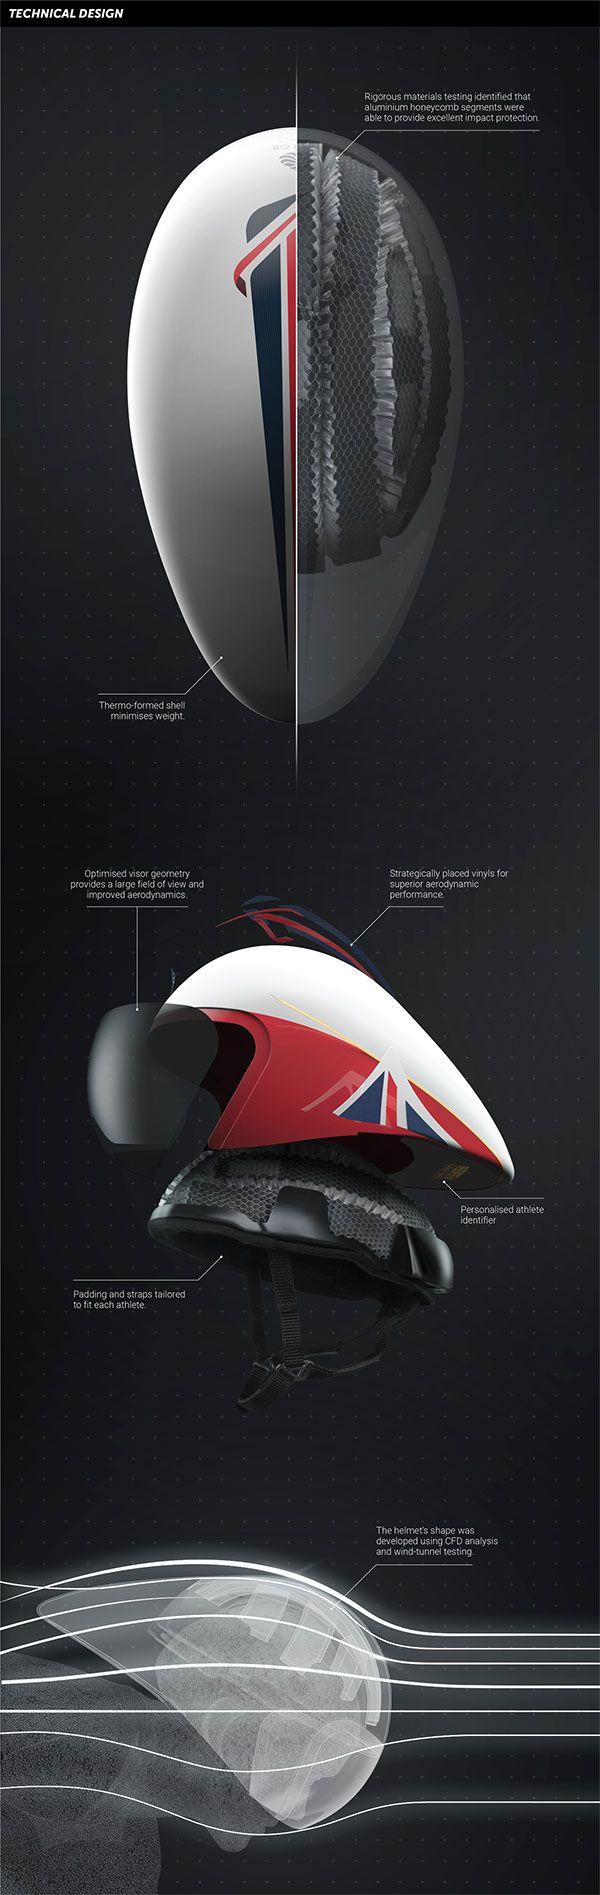 Team GB Olympic Cycling Helmet - Rio 2016 on Behance